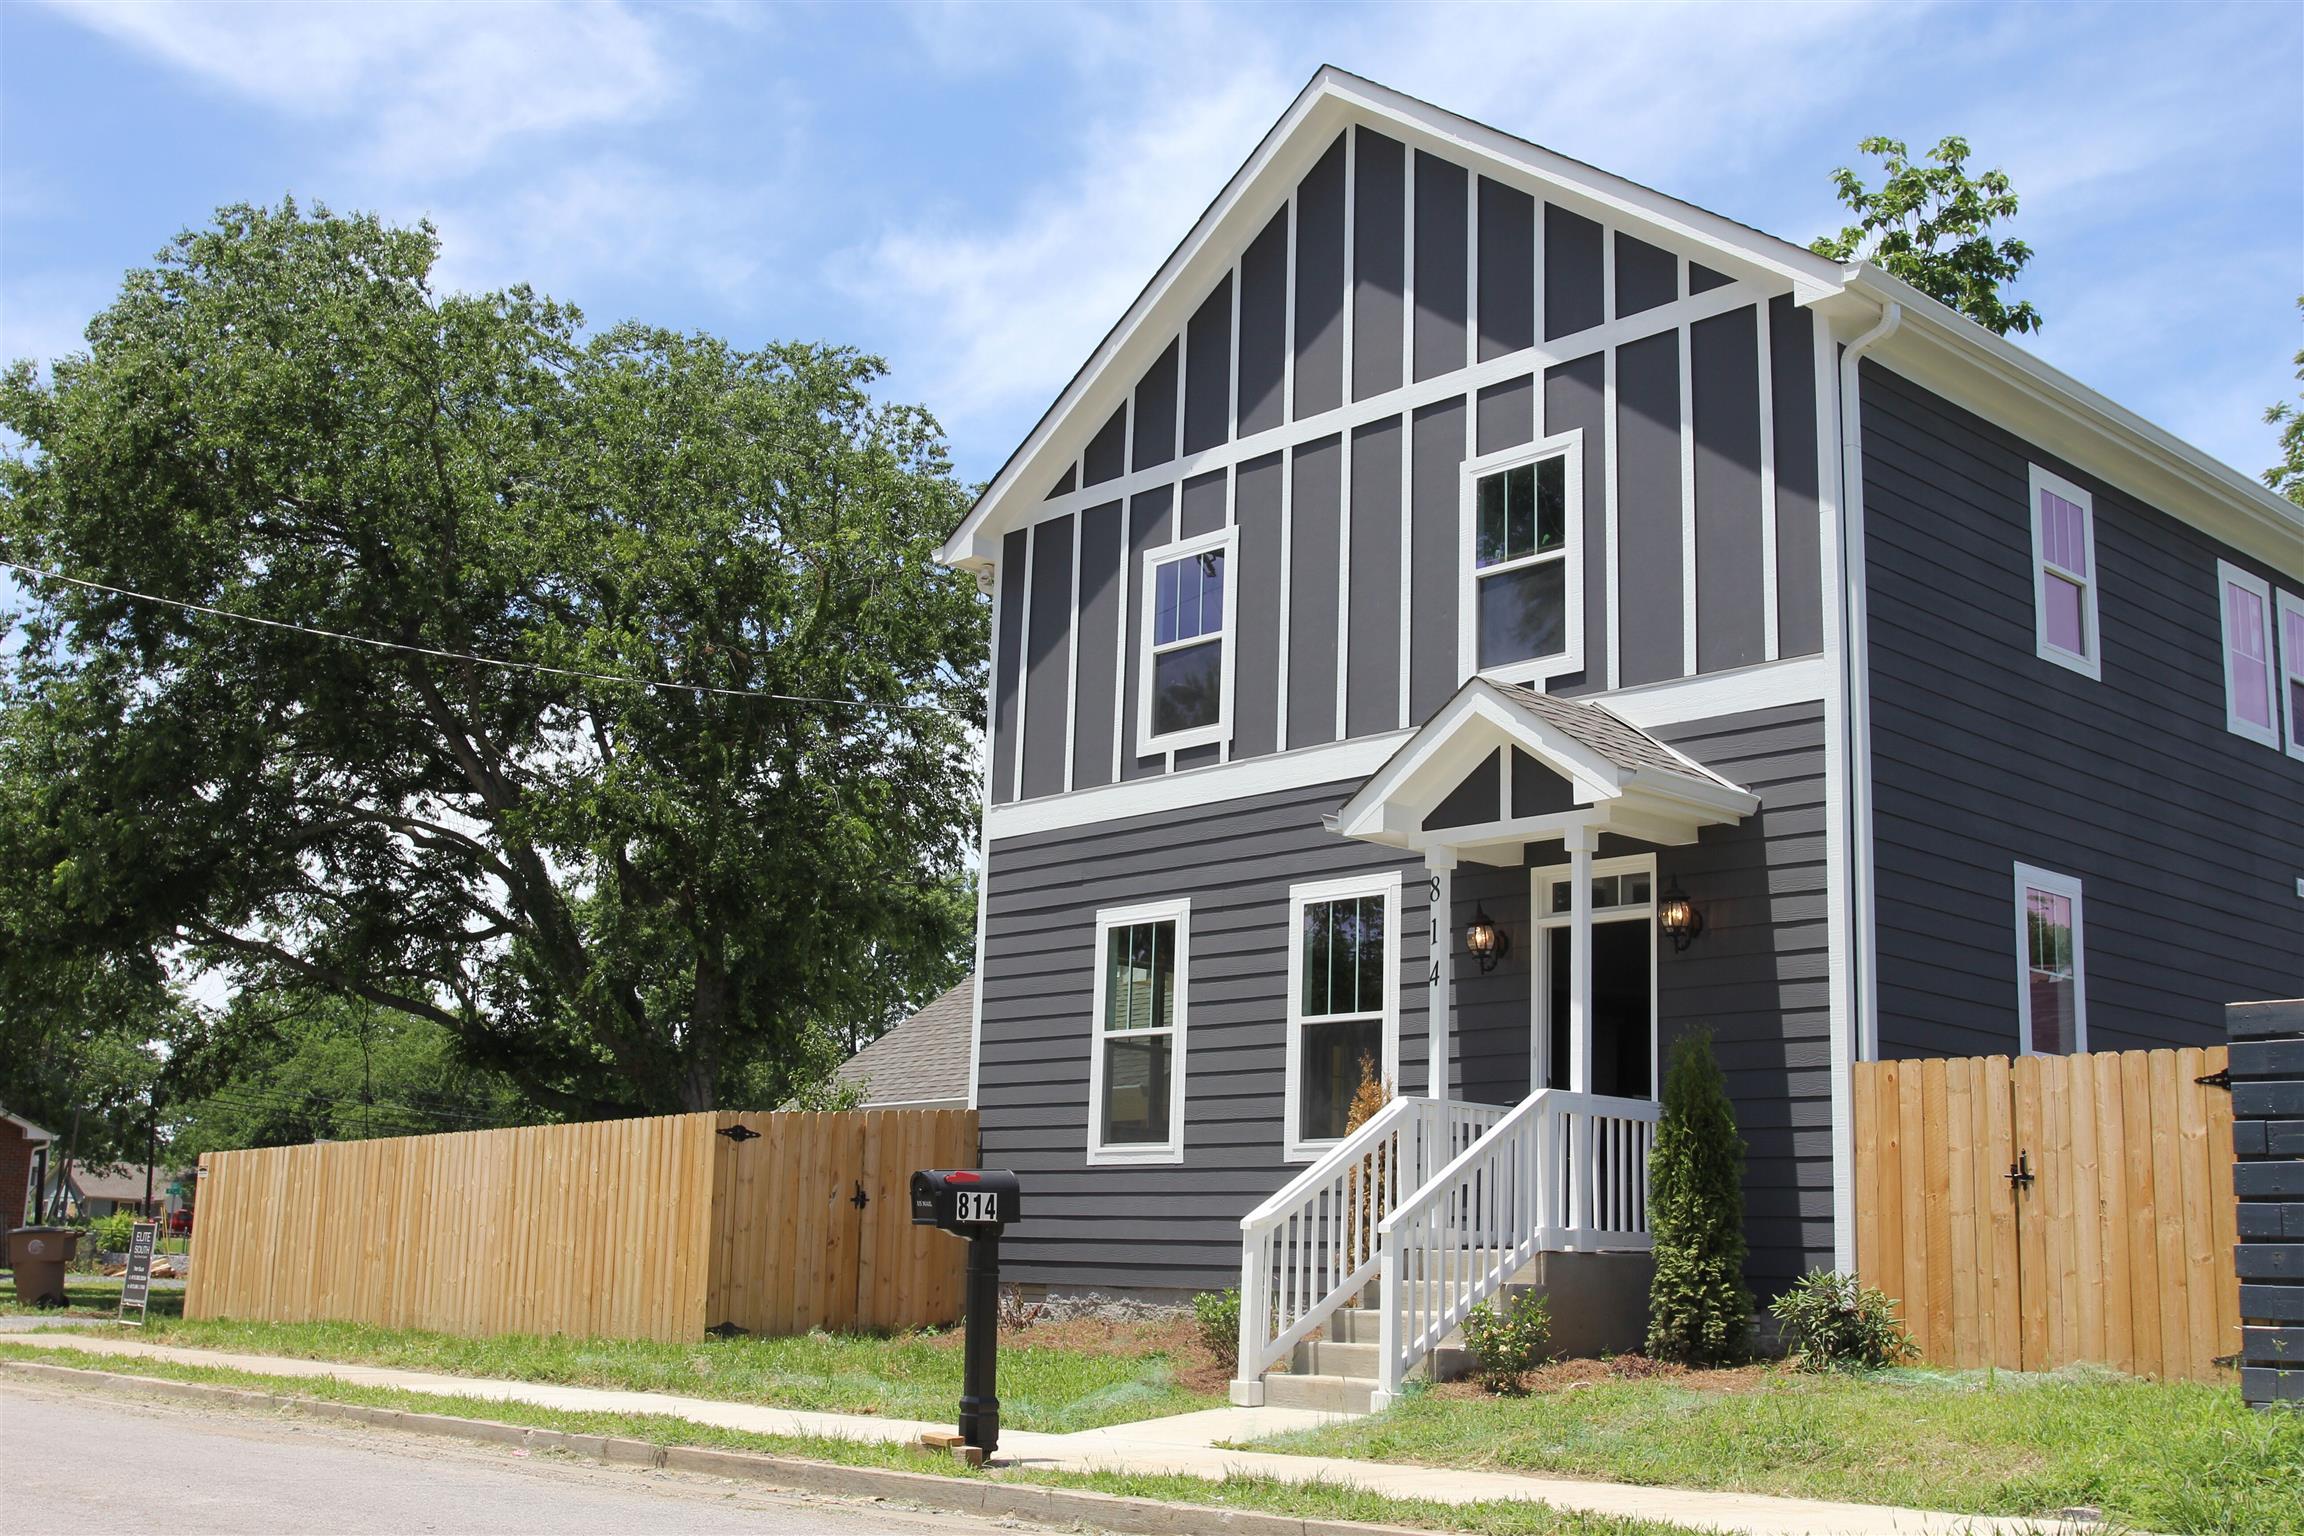 814 Coffee St, Nashville, TN 37208 - Nashville, TN real estate listing